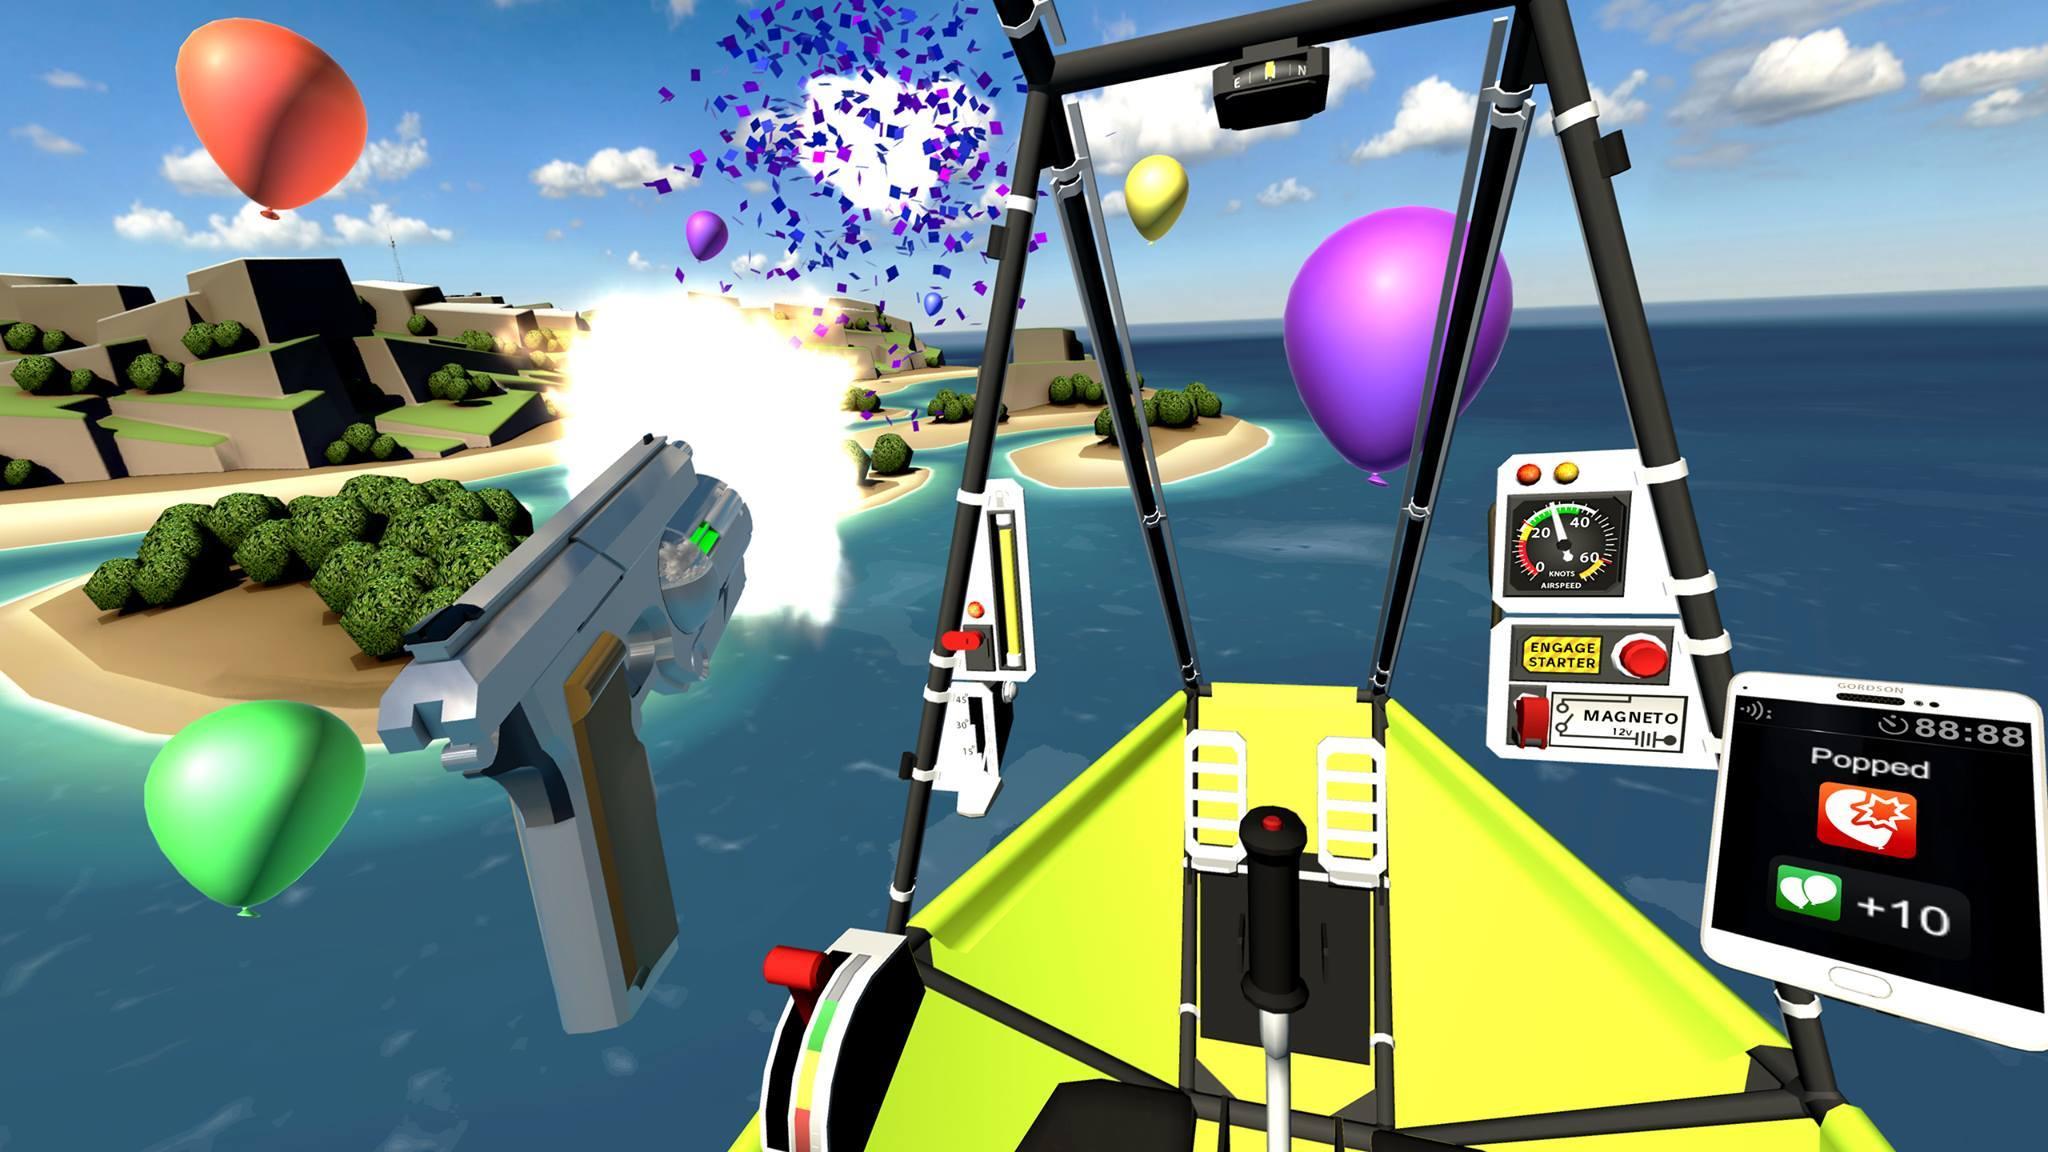 Ultrawings VR headed to PSVR 'soon'